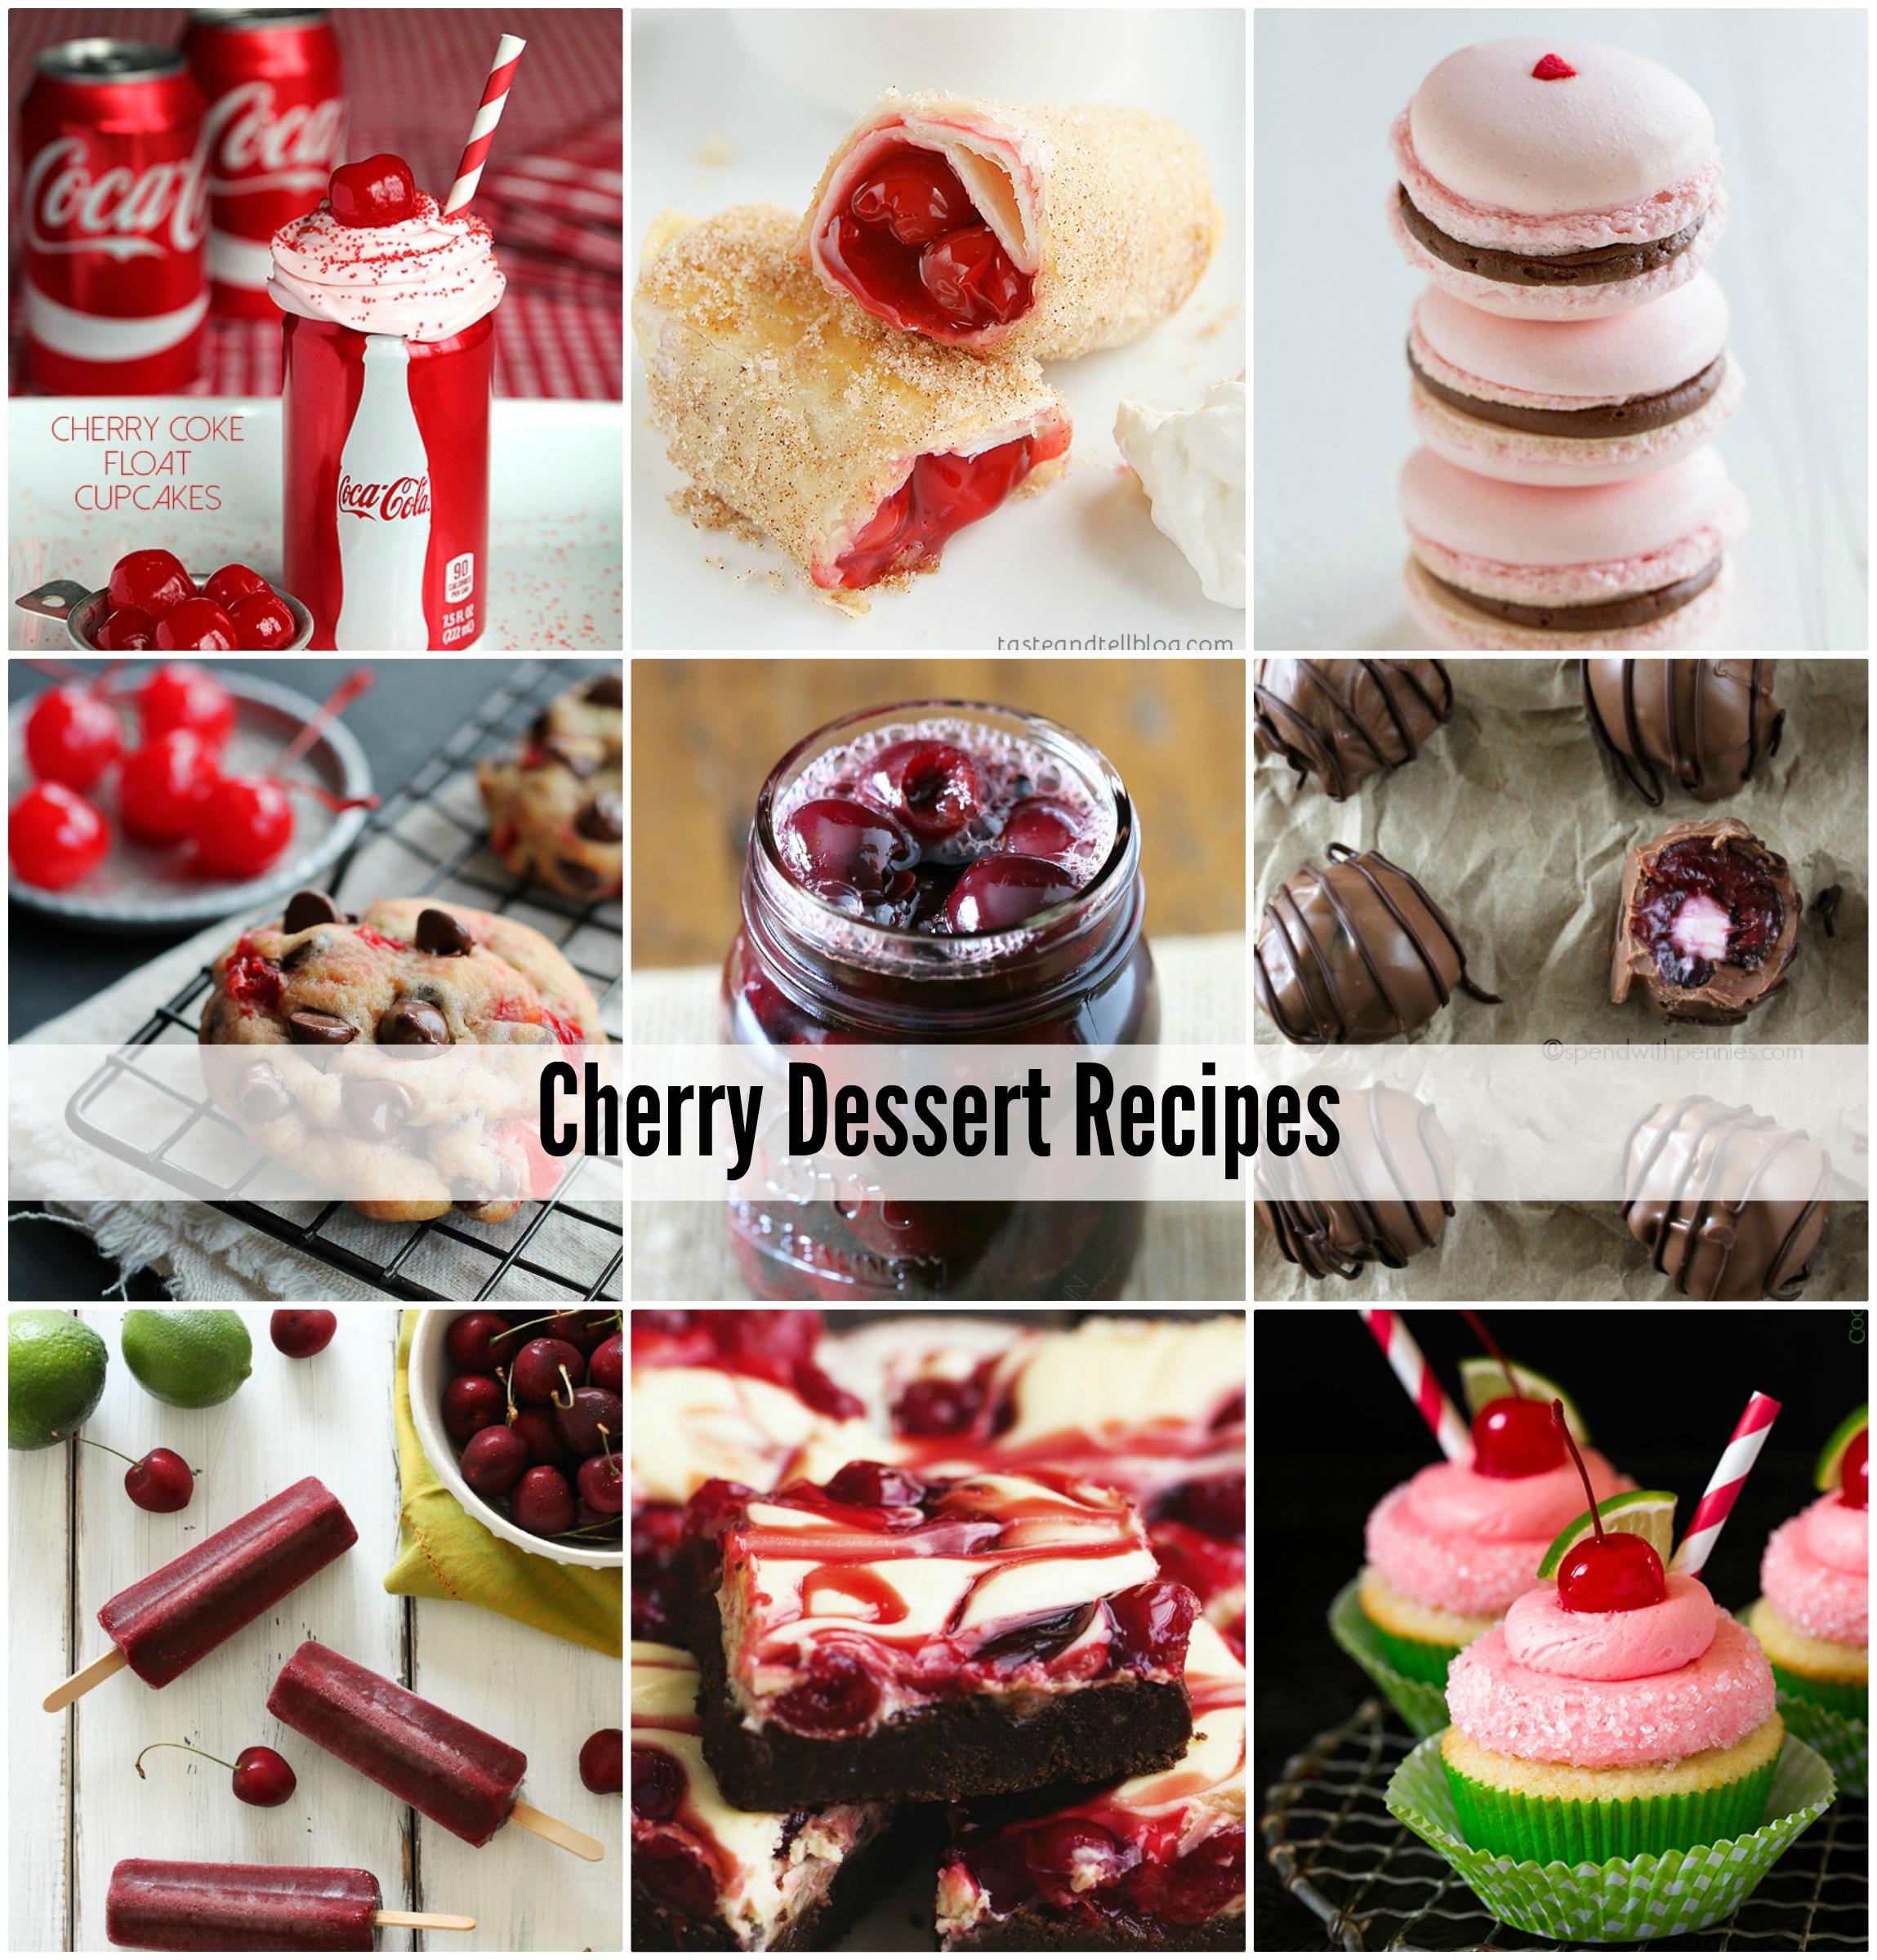 Cherry Dessert Recipes